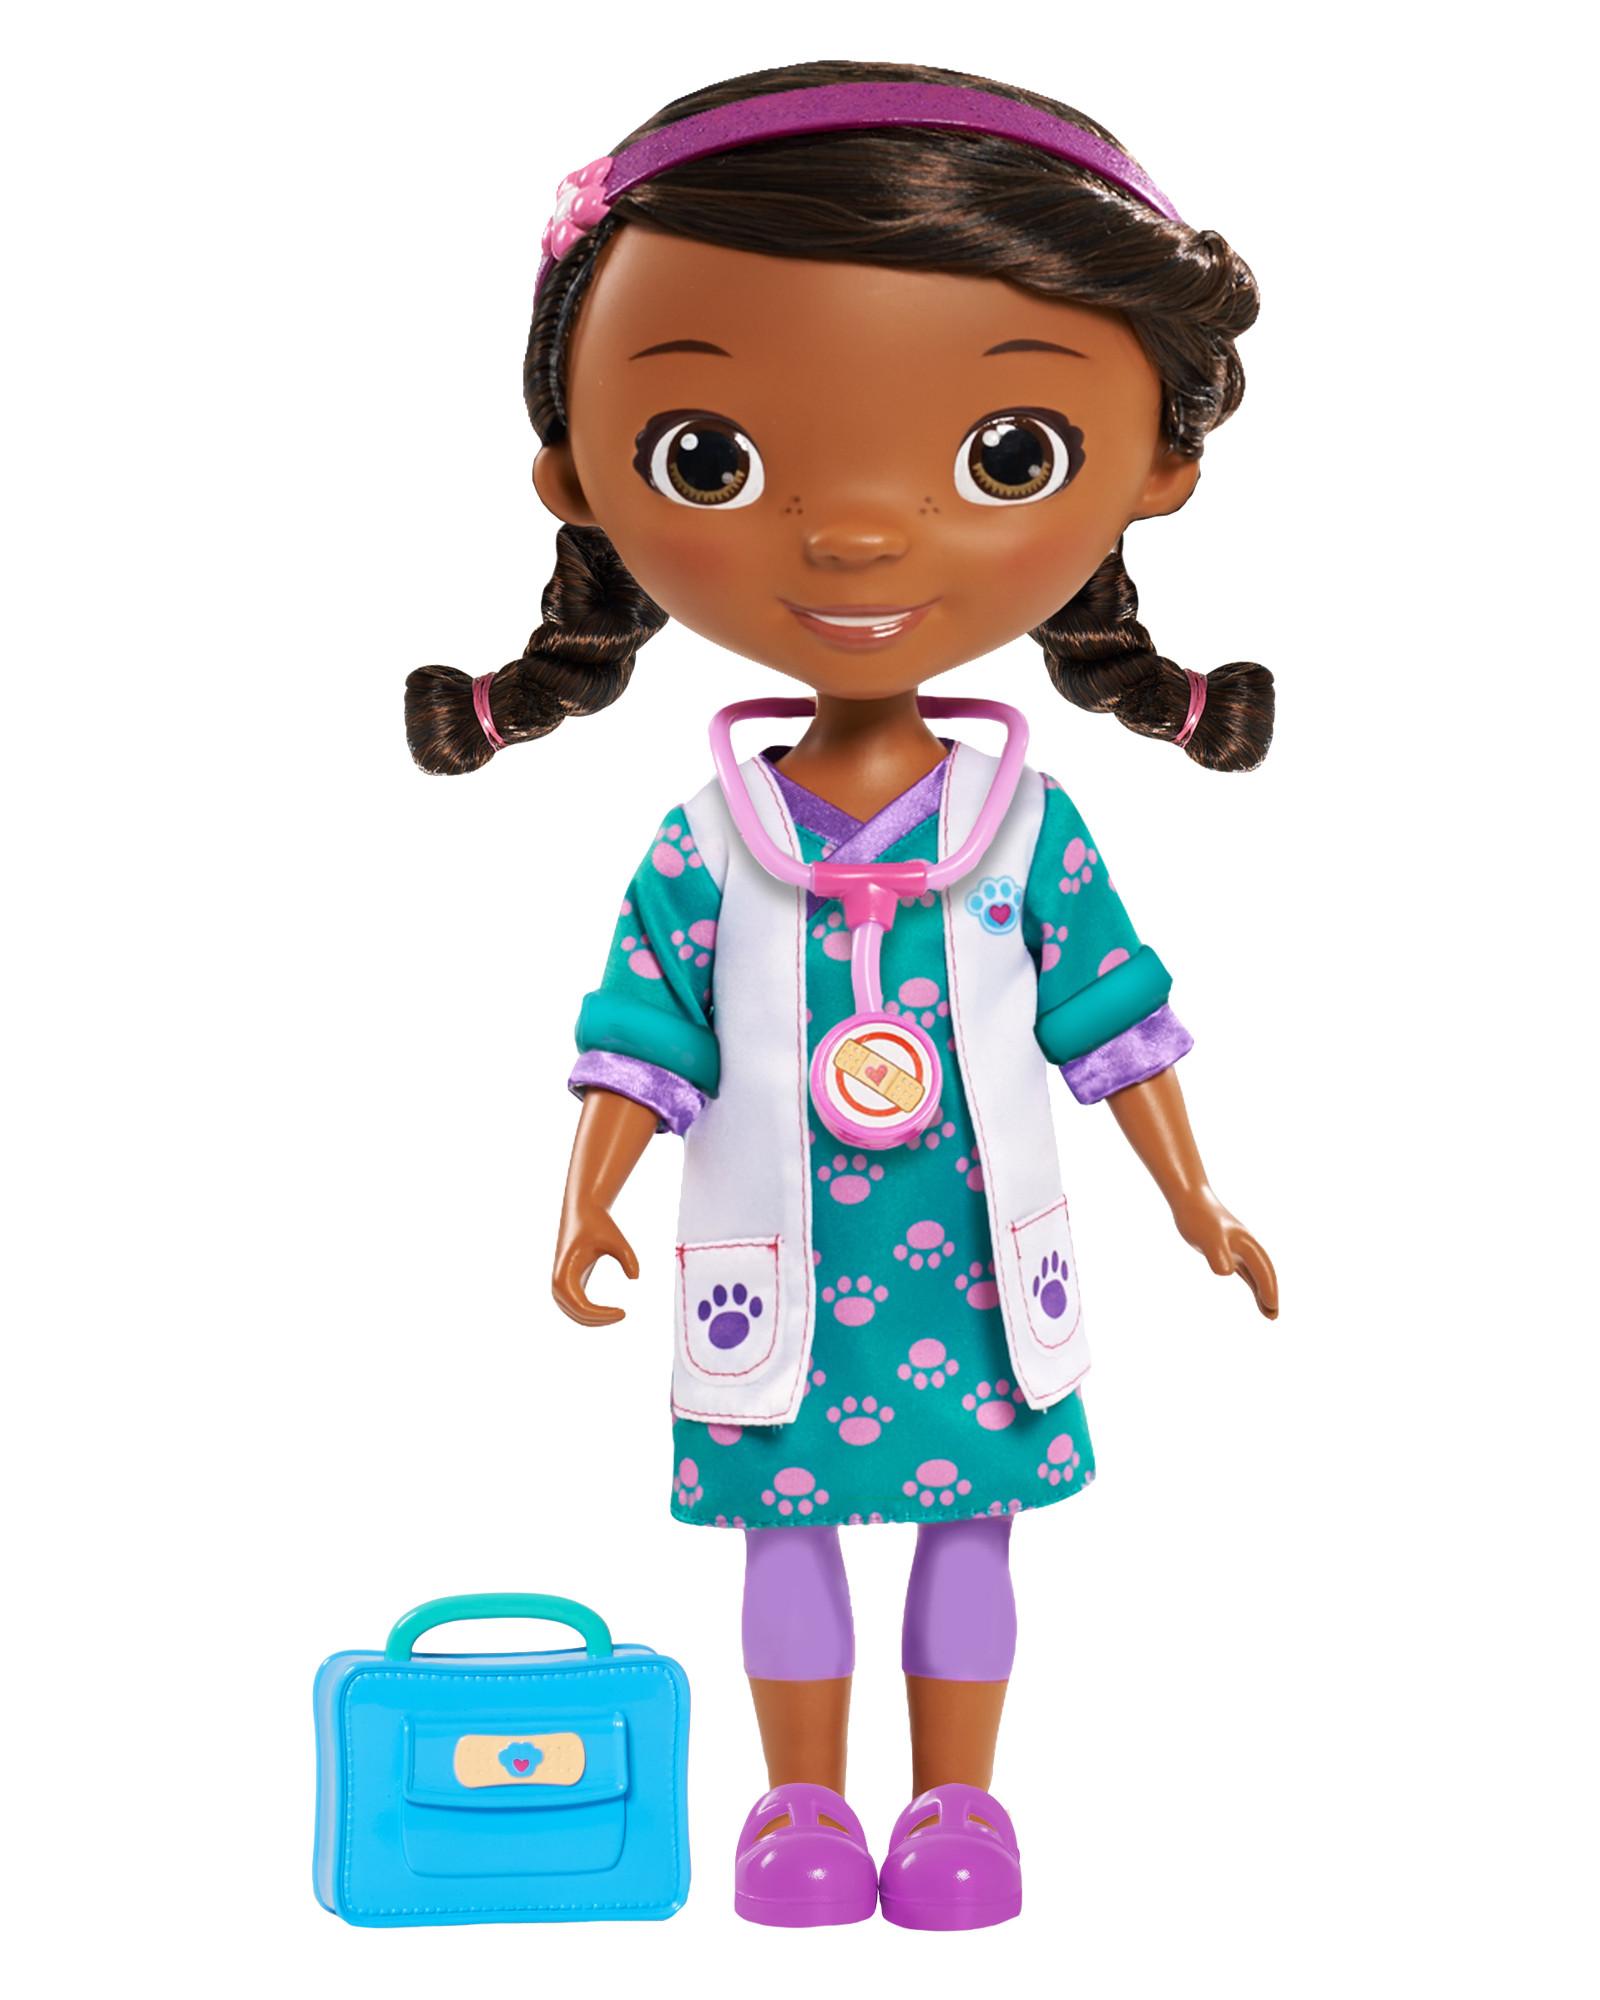 Disney 15 Doc McStuffins Doll Blue Physician